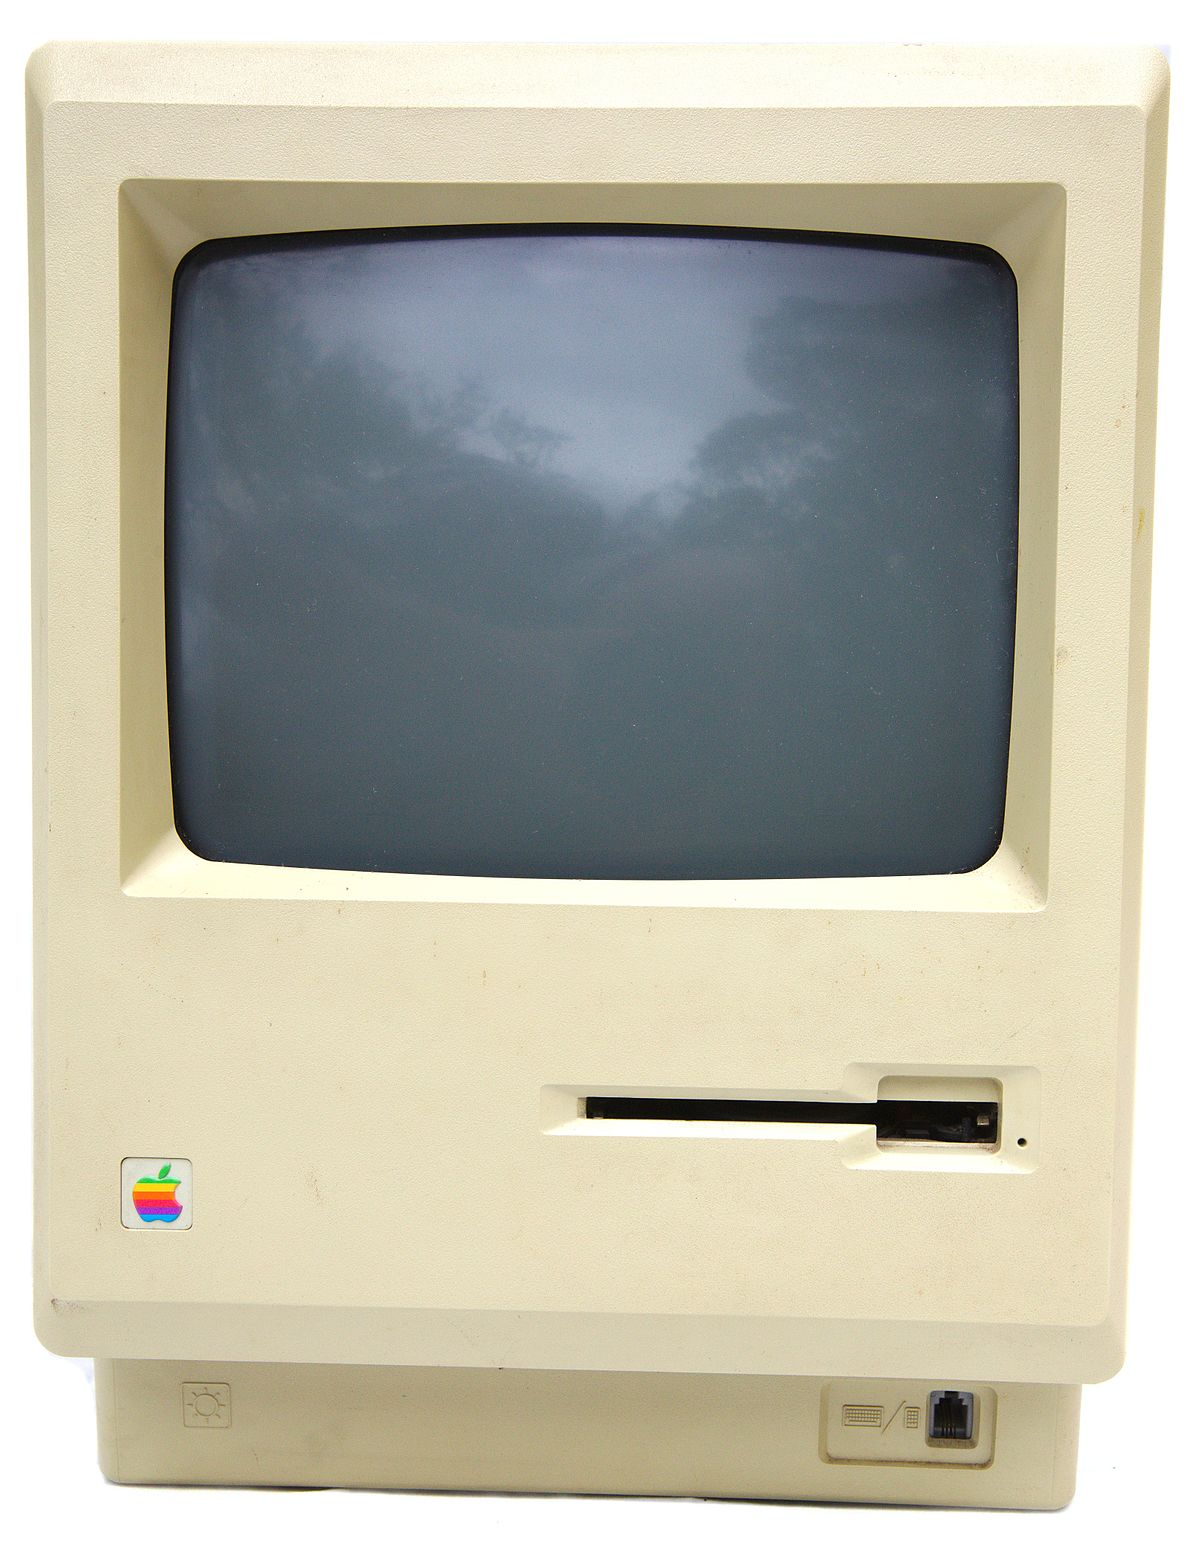 Macintosh 512K - Wikipedia